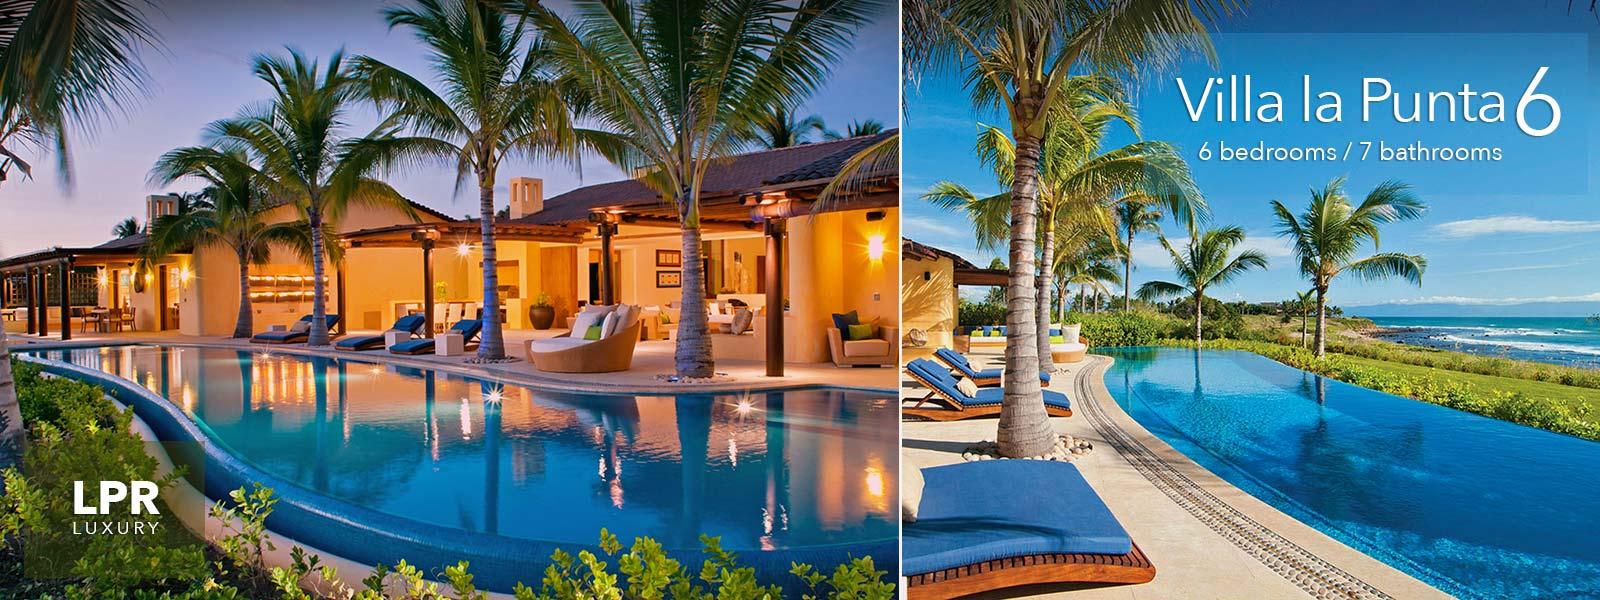 Villa La Punta 6 - Luxury real estate and vacation rentals at the Punta Mita Resort, Mexico